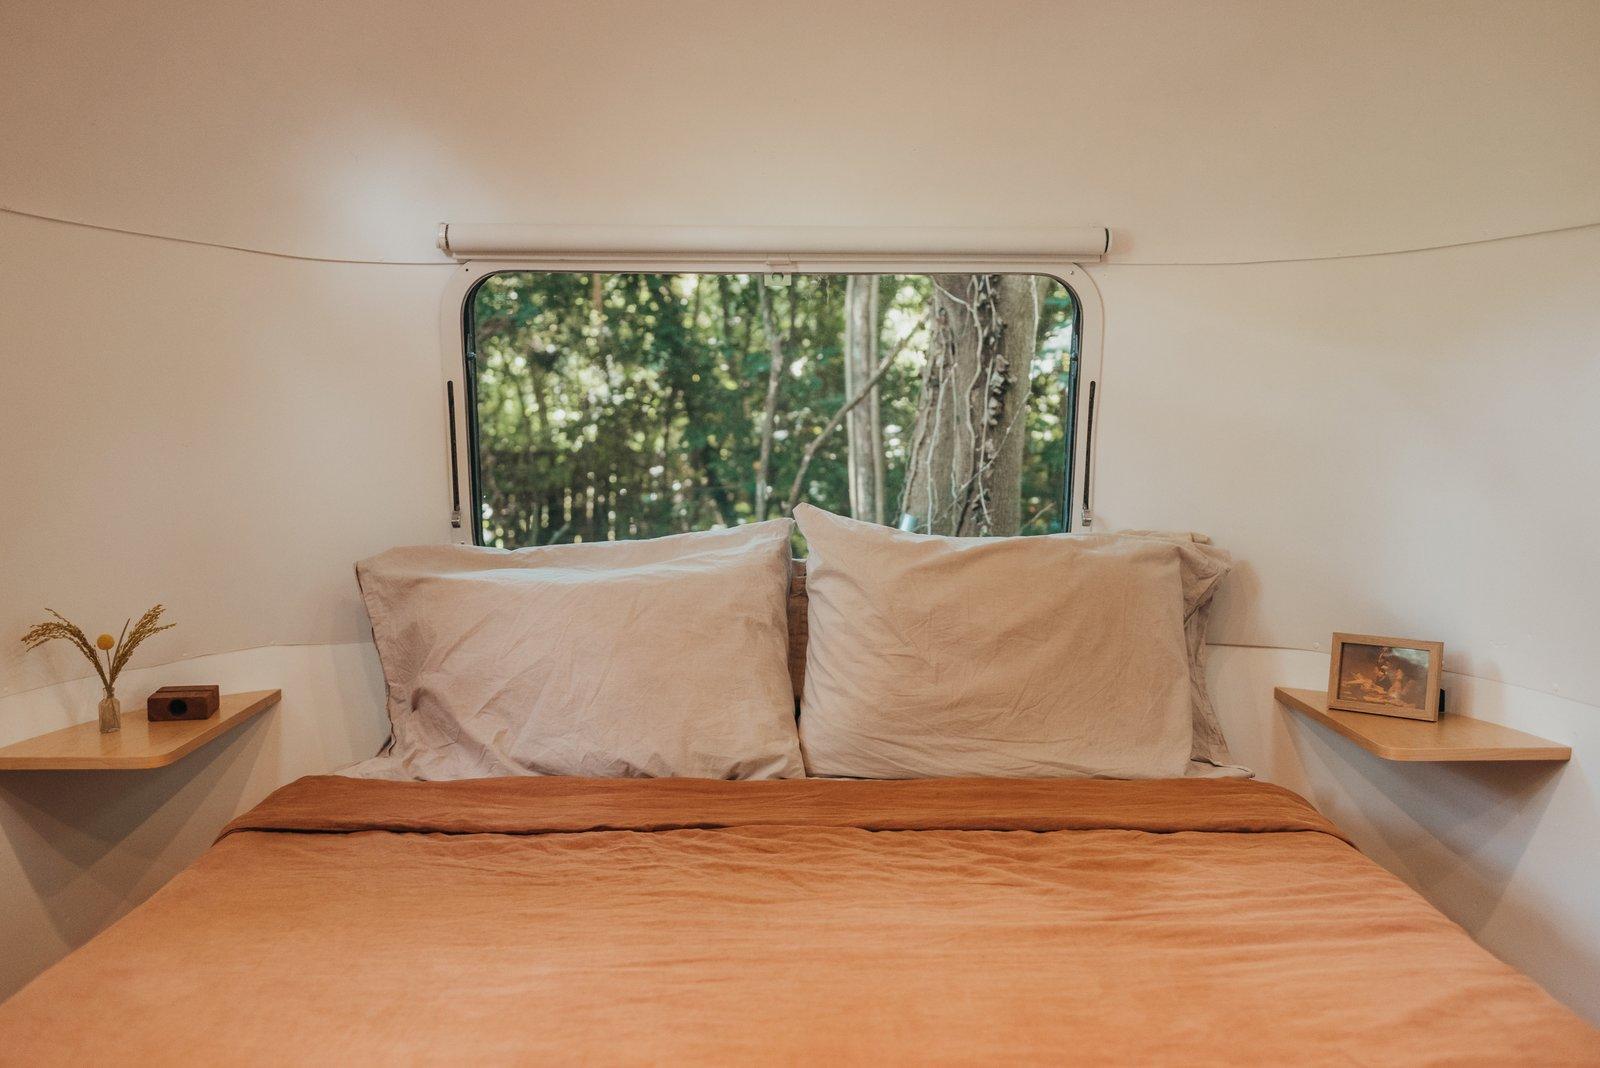 1973 Airstream Remodel bedroom